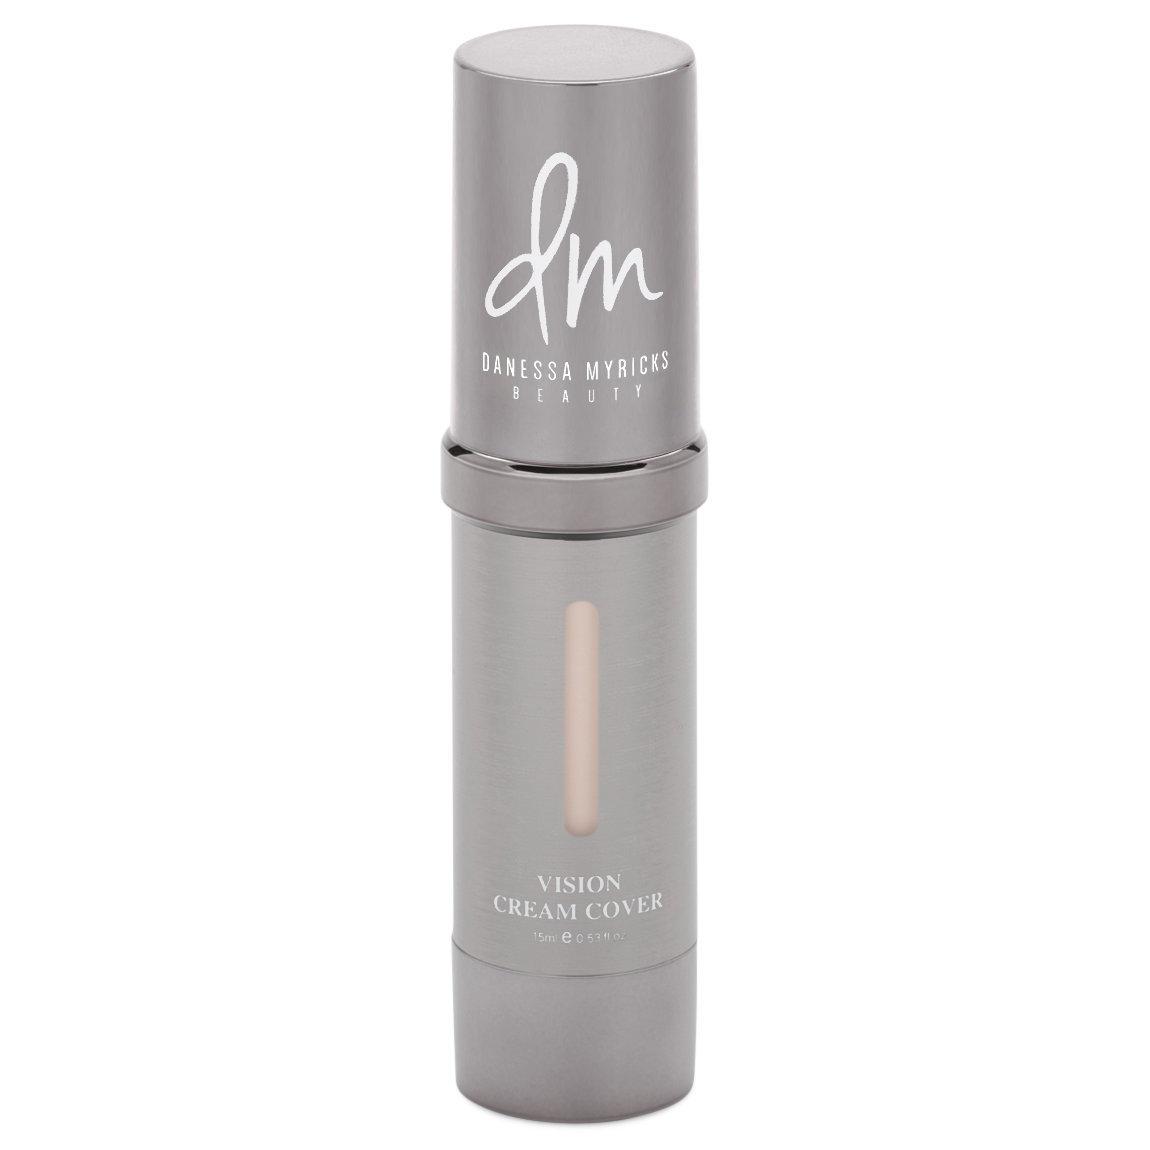 Danessa Myricks Beauty Vision Cream Cover N01 - Neutral alternative view 1.